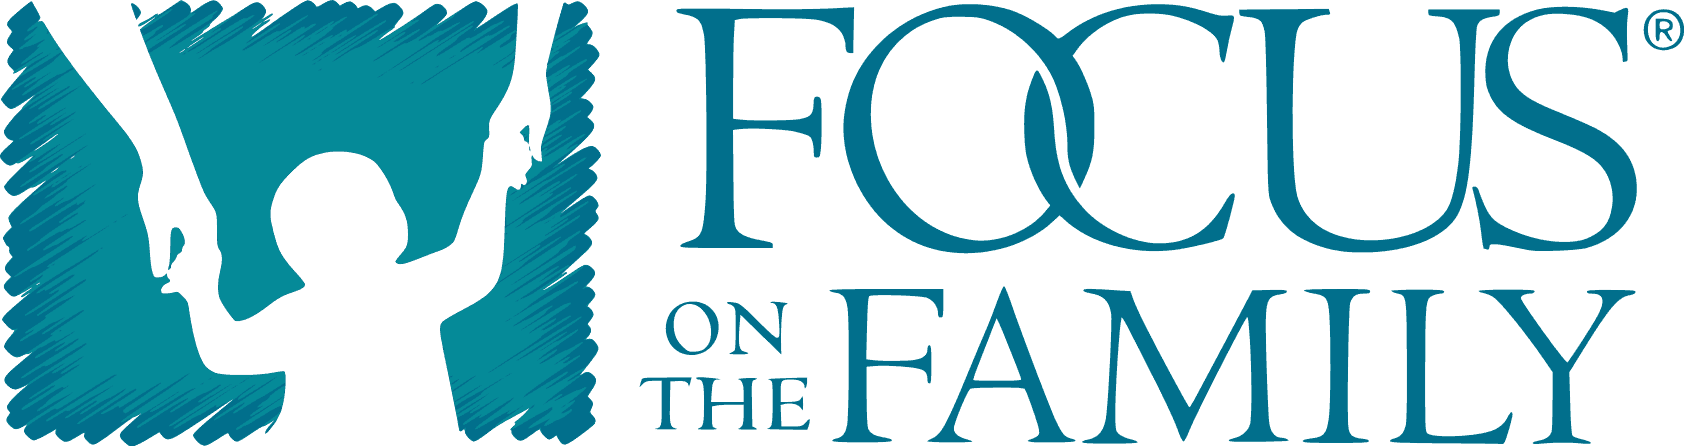 Focos-on-the-Family-Logo